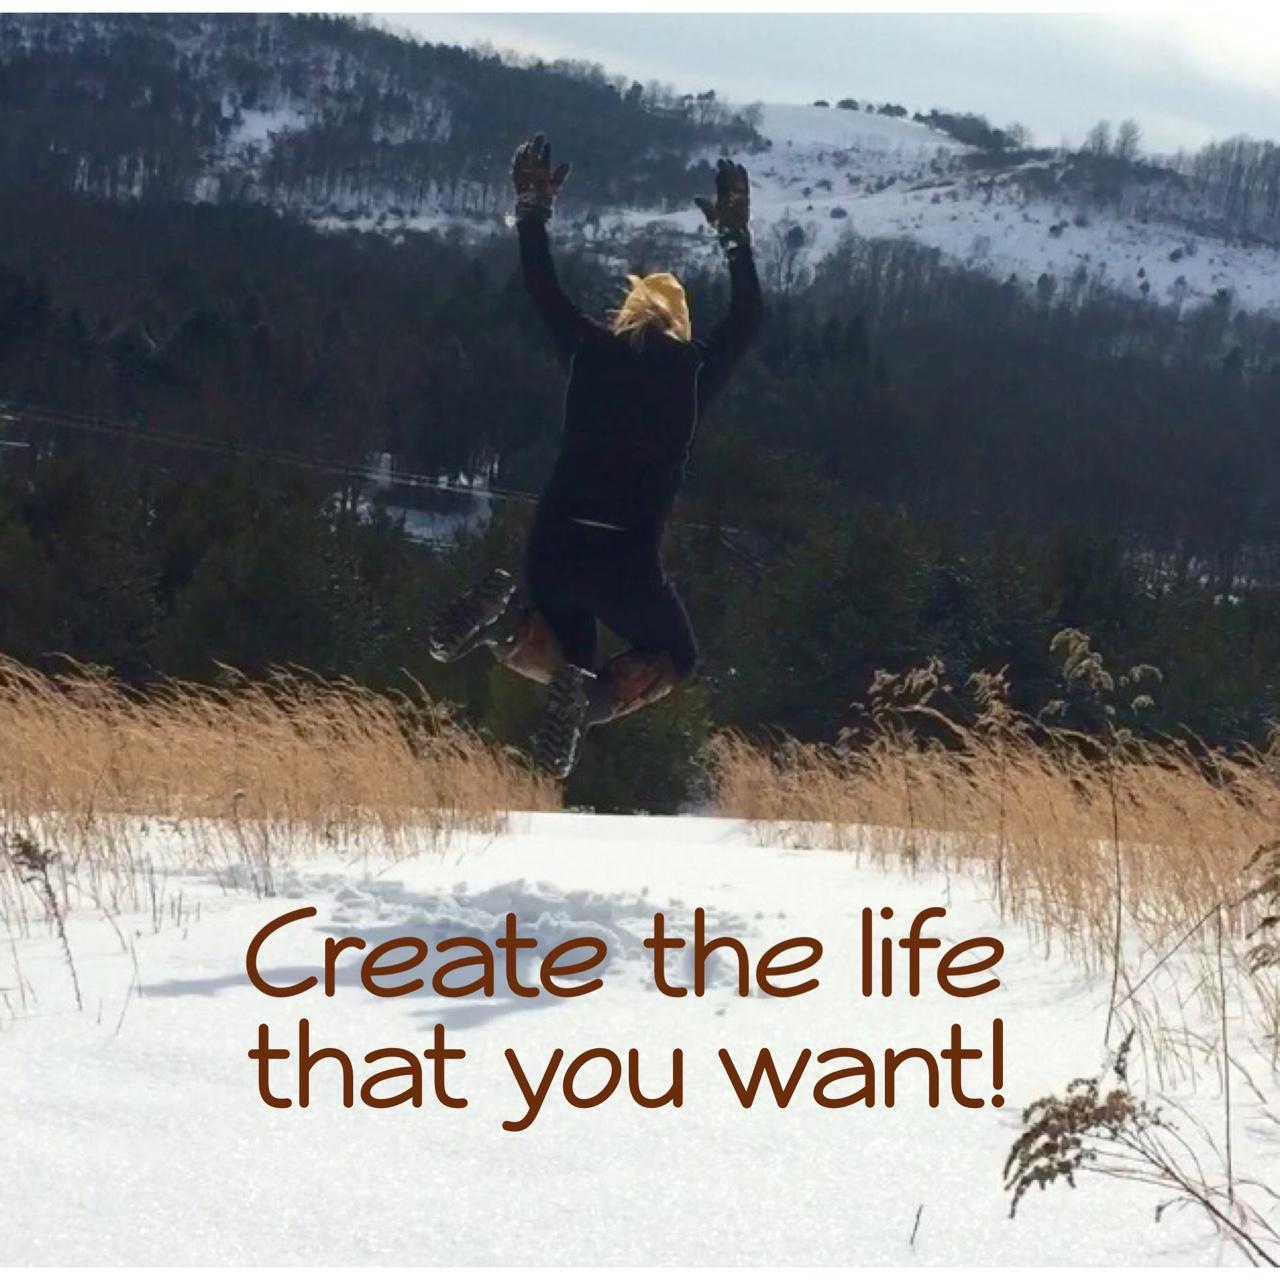 Inspiring and reaching goals